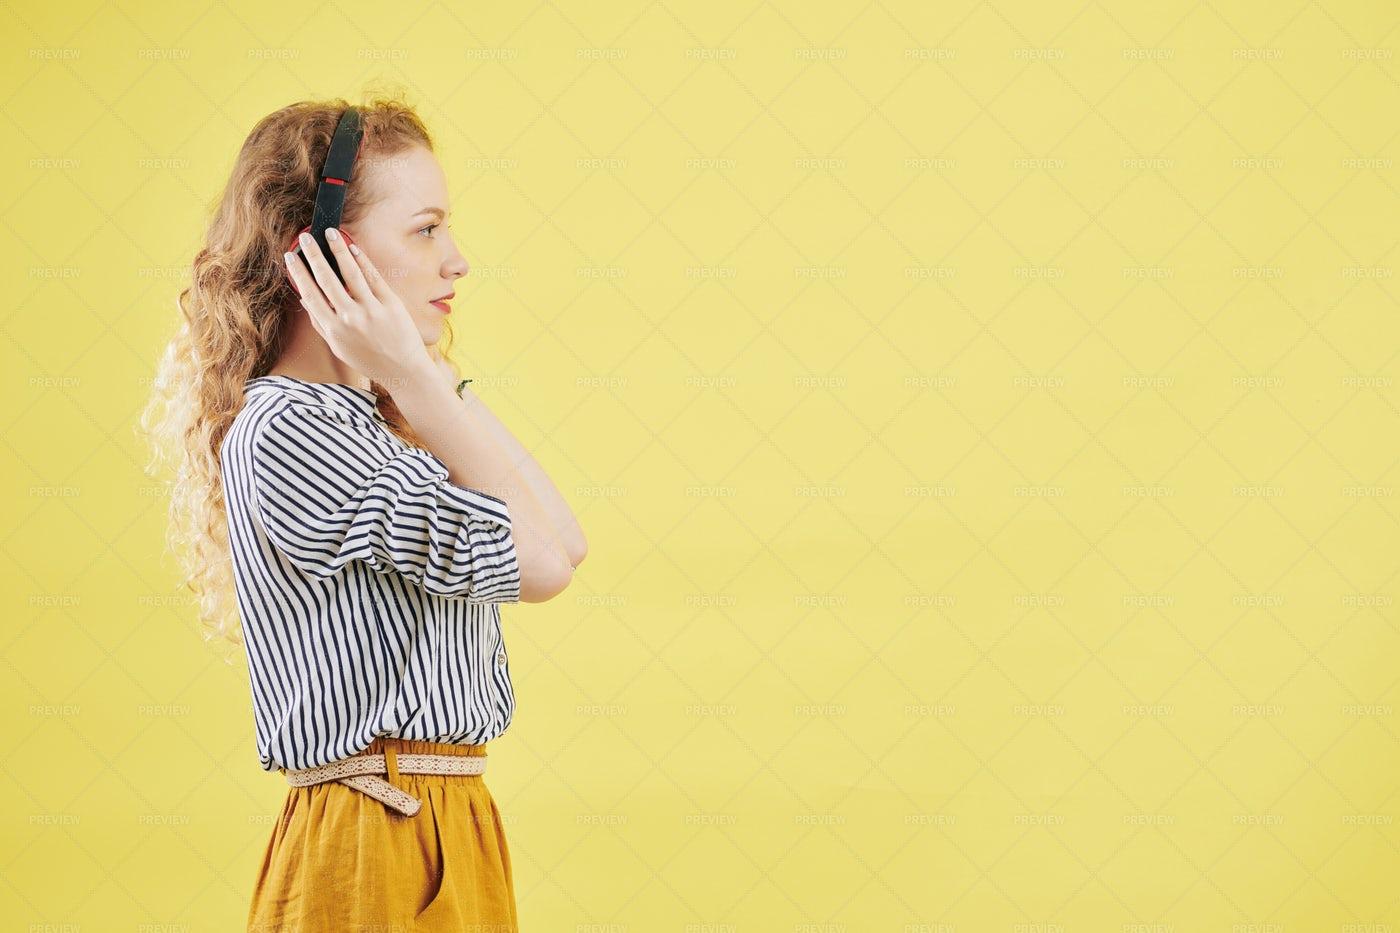 Young Woman Listening Audiobook: Stock Photos